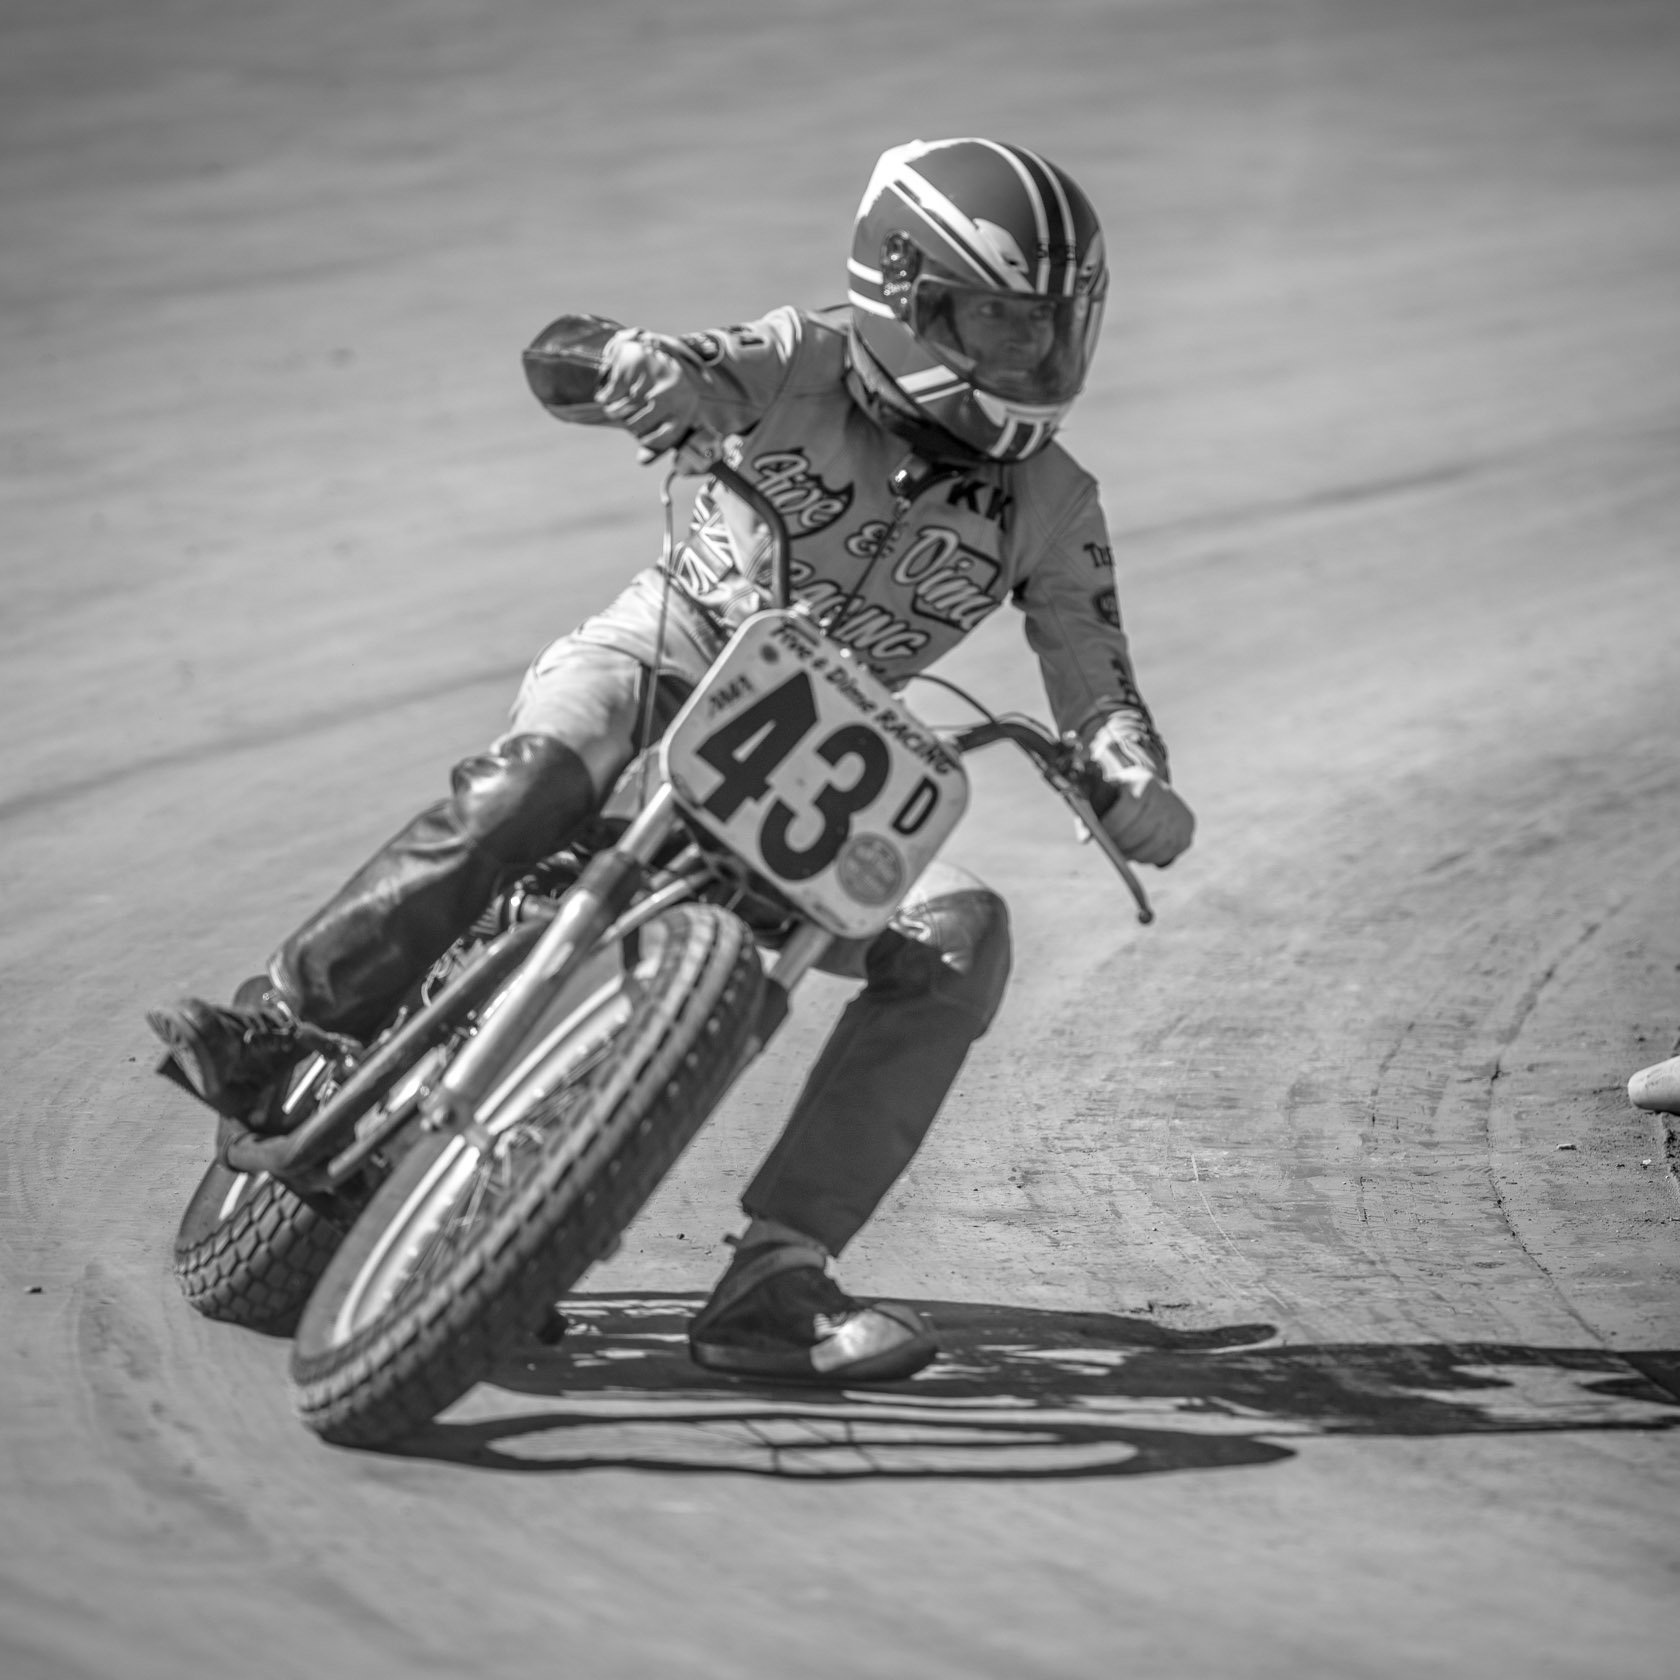 Dirt Track Racking 46